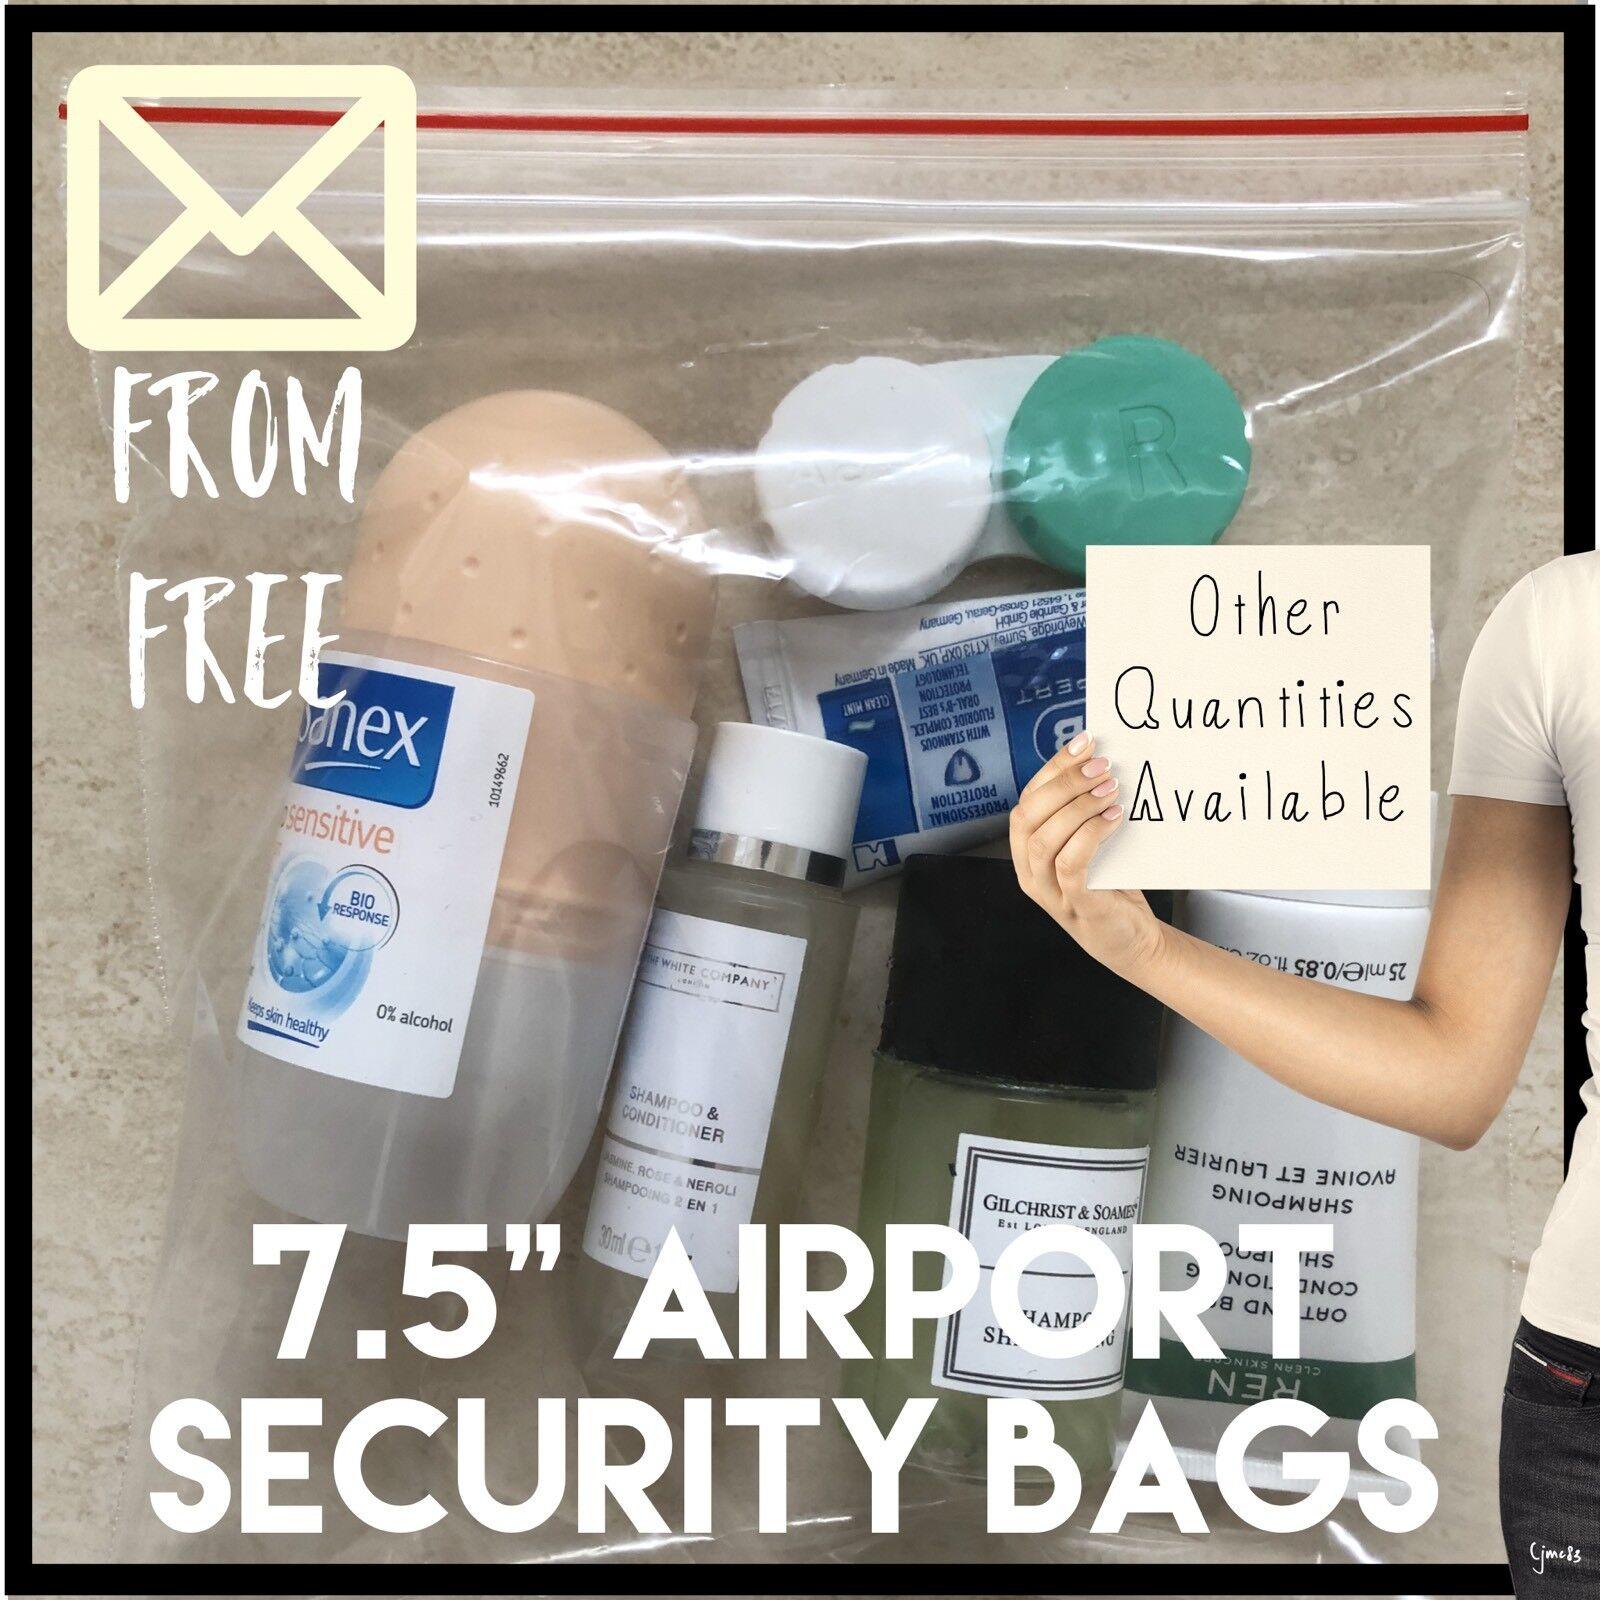 5 x Transparent plastique Vacances des sacs en plastique Transparent liquides pour avion de sécurité f05551